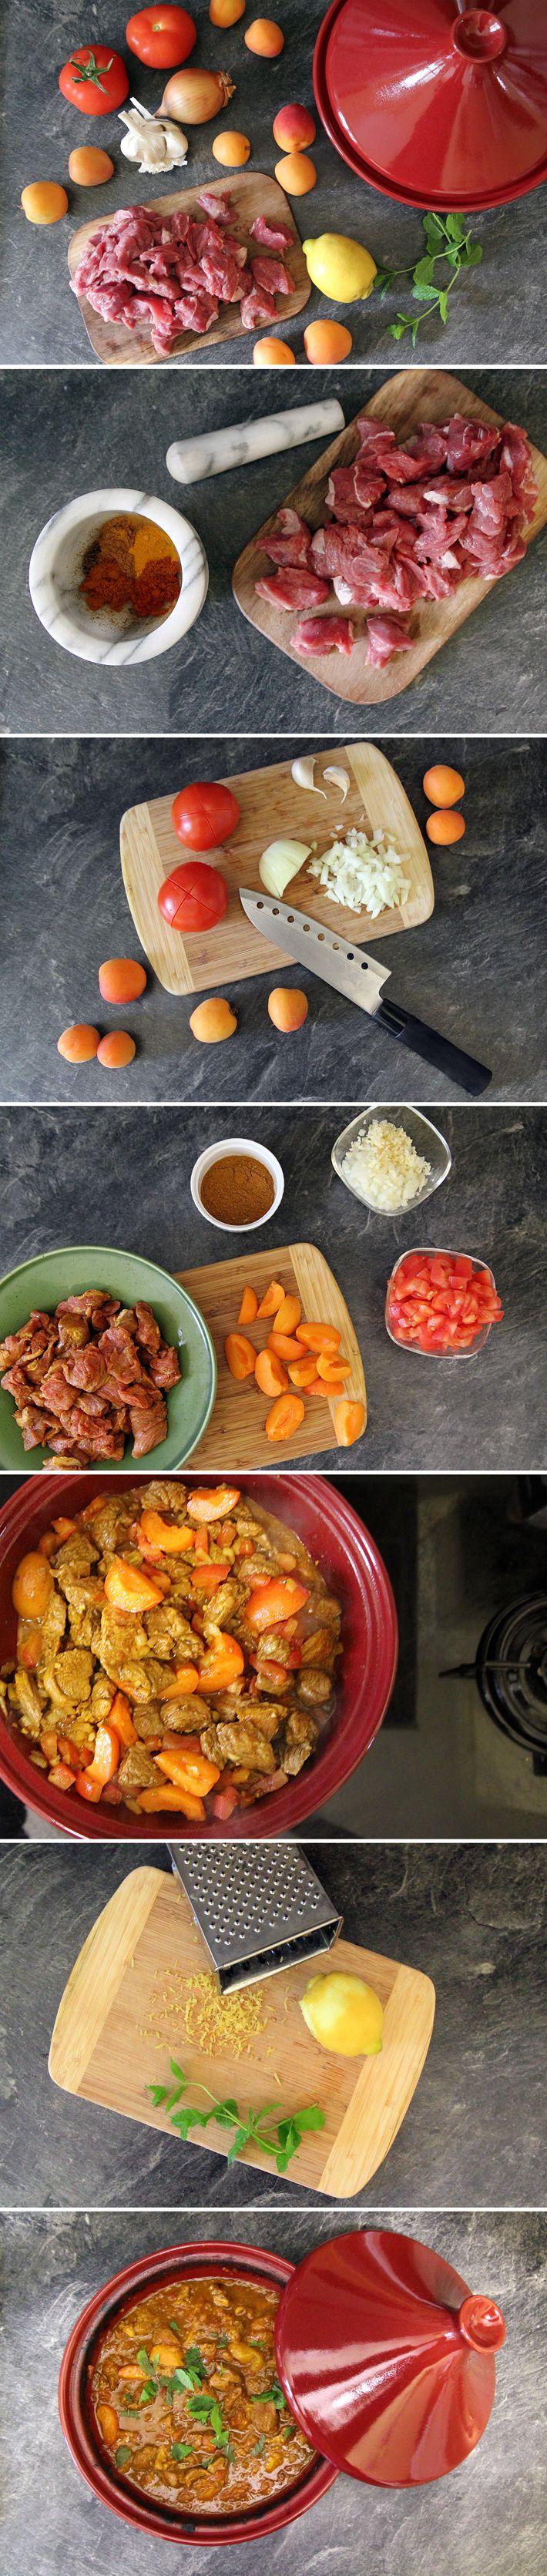 Marokkanische kuche suss